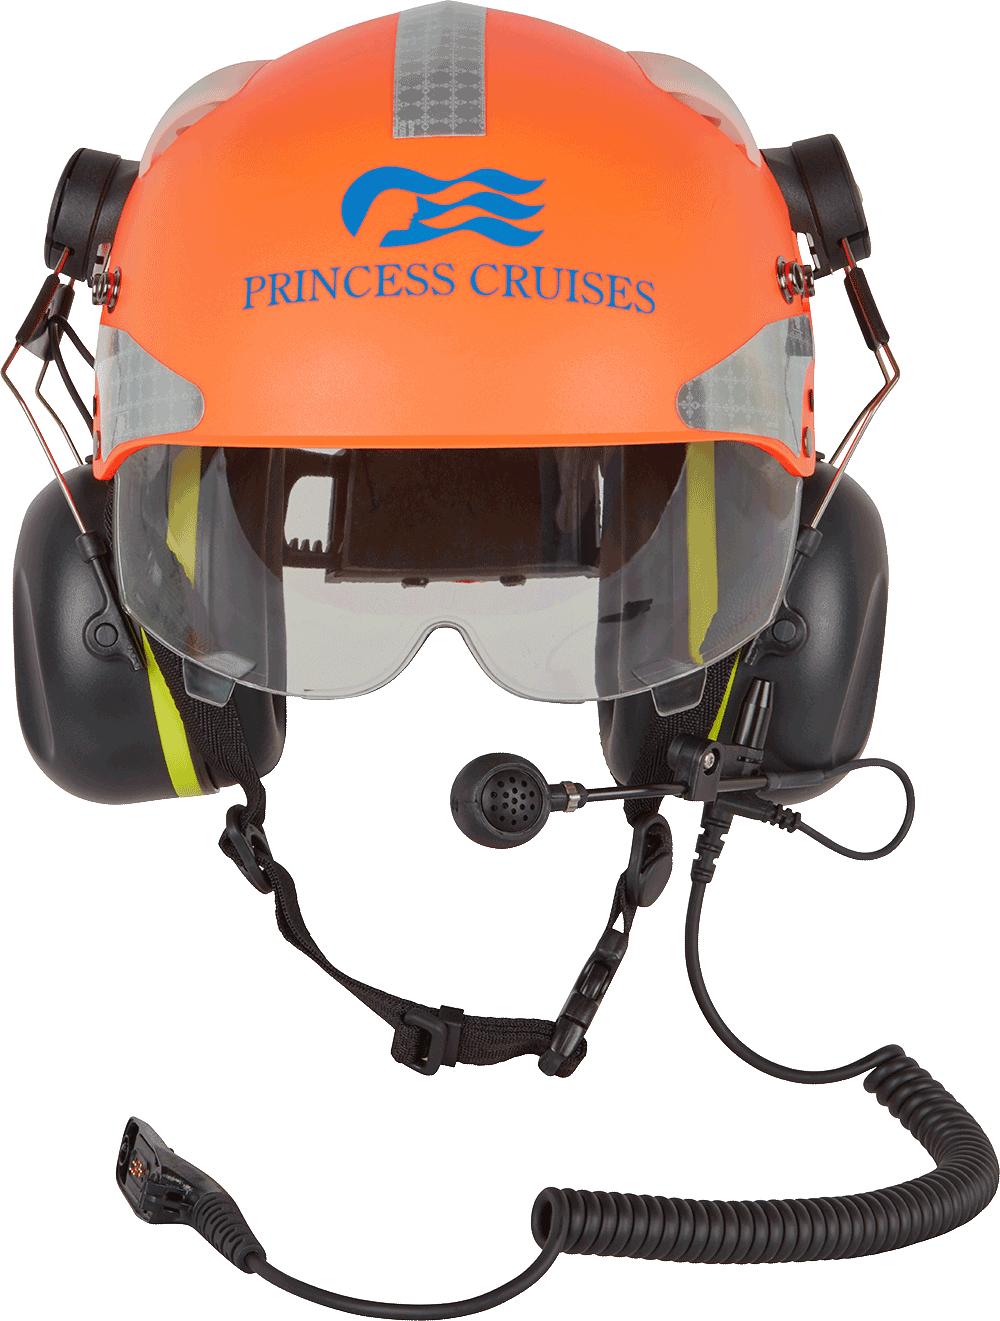 Orange_Princess_Cruises_Helmet_Front